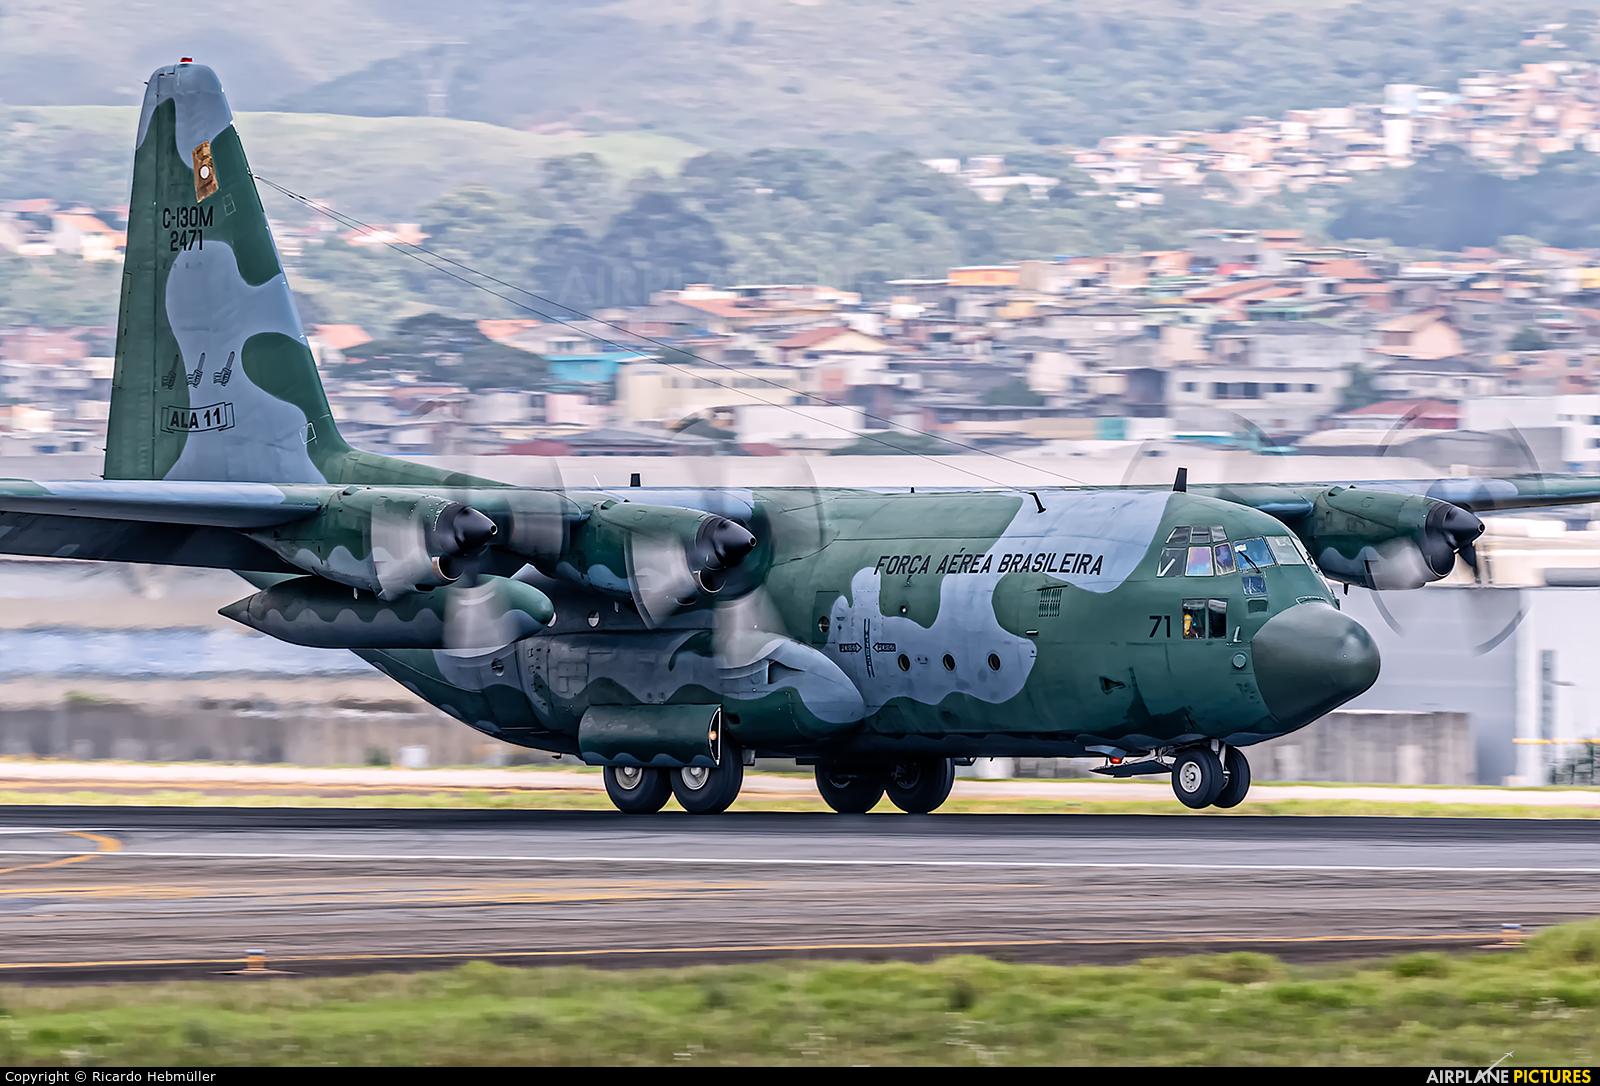 Brazil - Air Force 2471 aircraft at São Paulo - Guarulhos